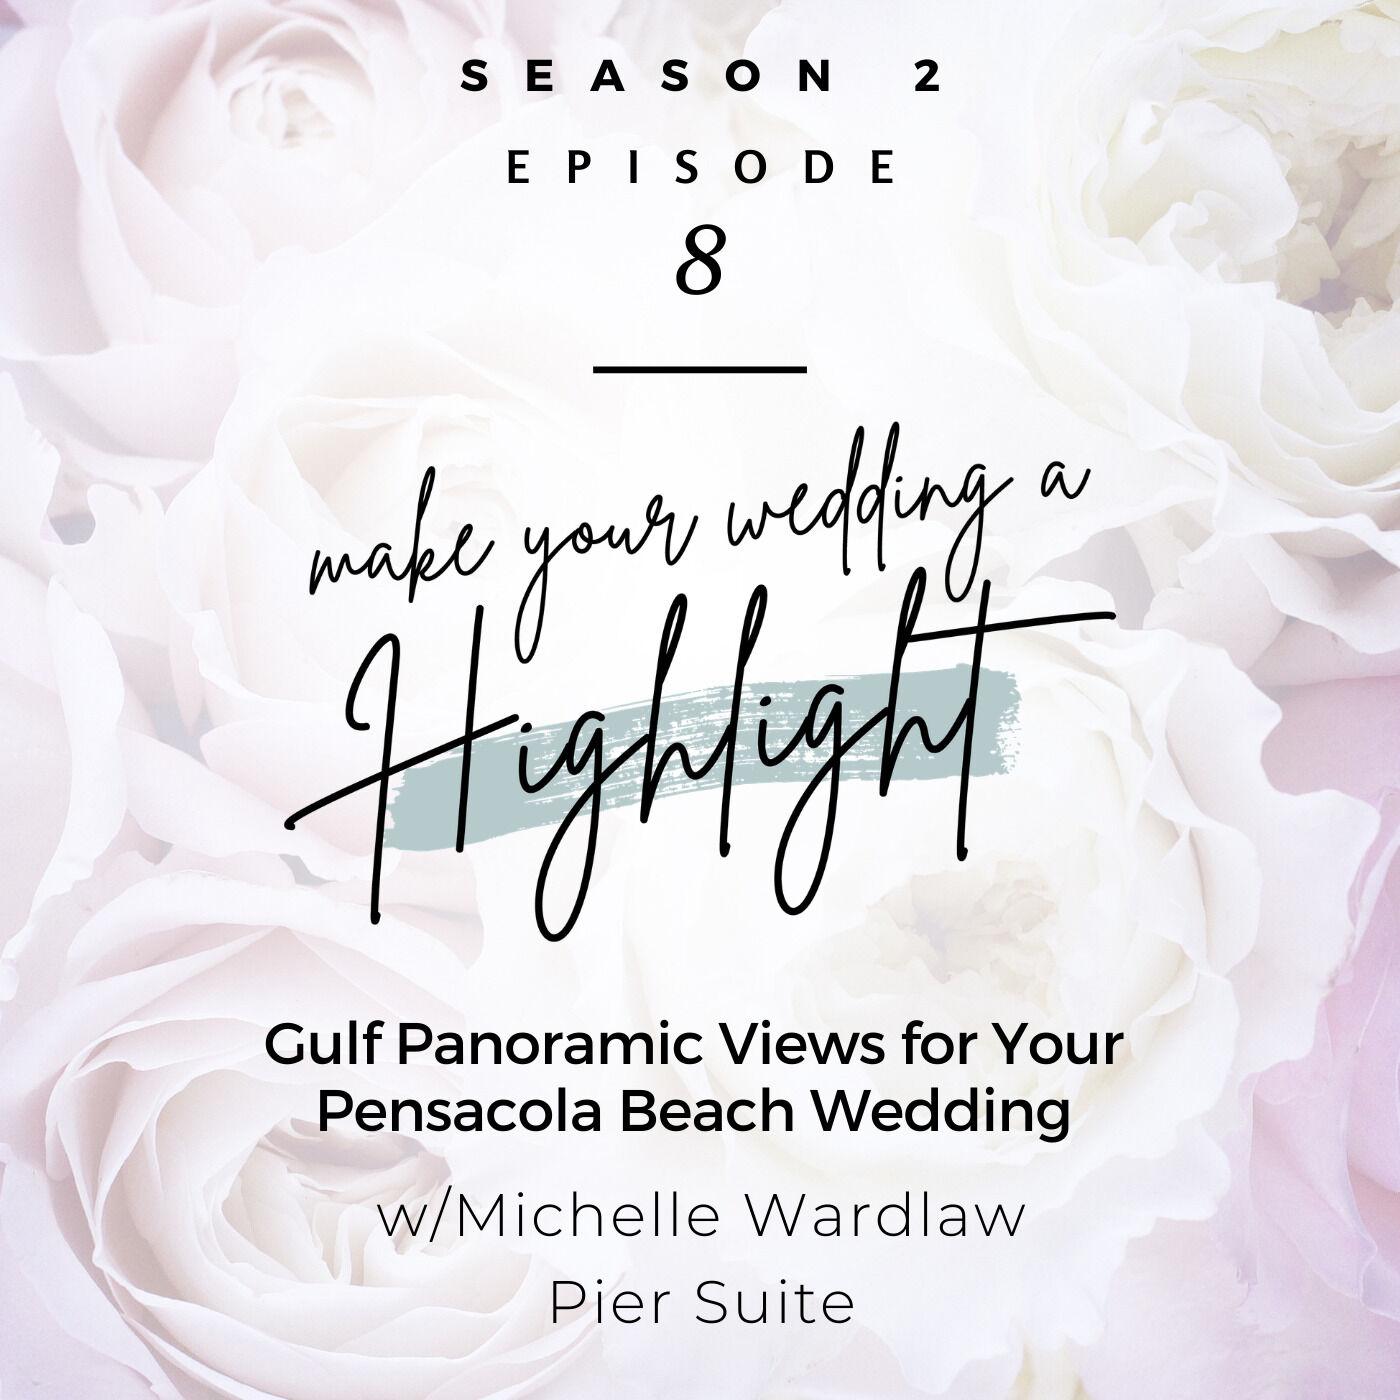 Gulf Panoramic Views for Your Pensacola Beach Wedding